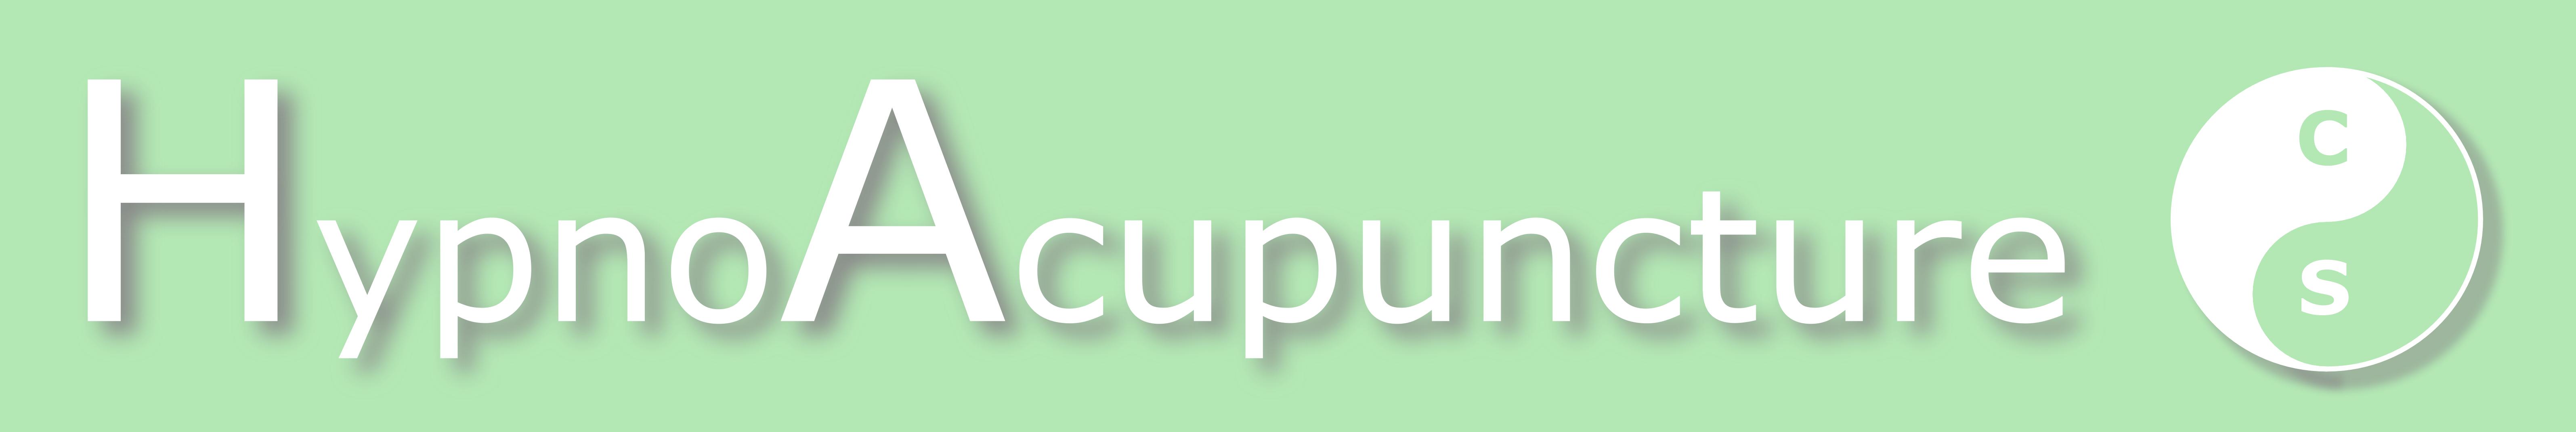 HypnoAcupuncture company logo